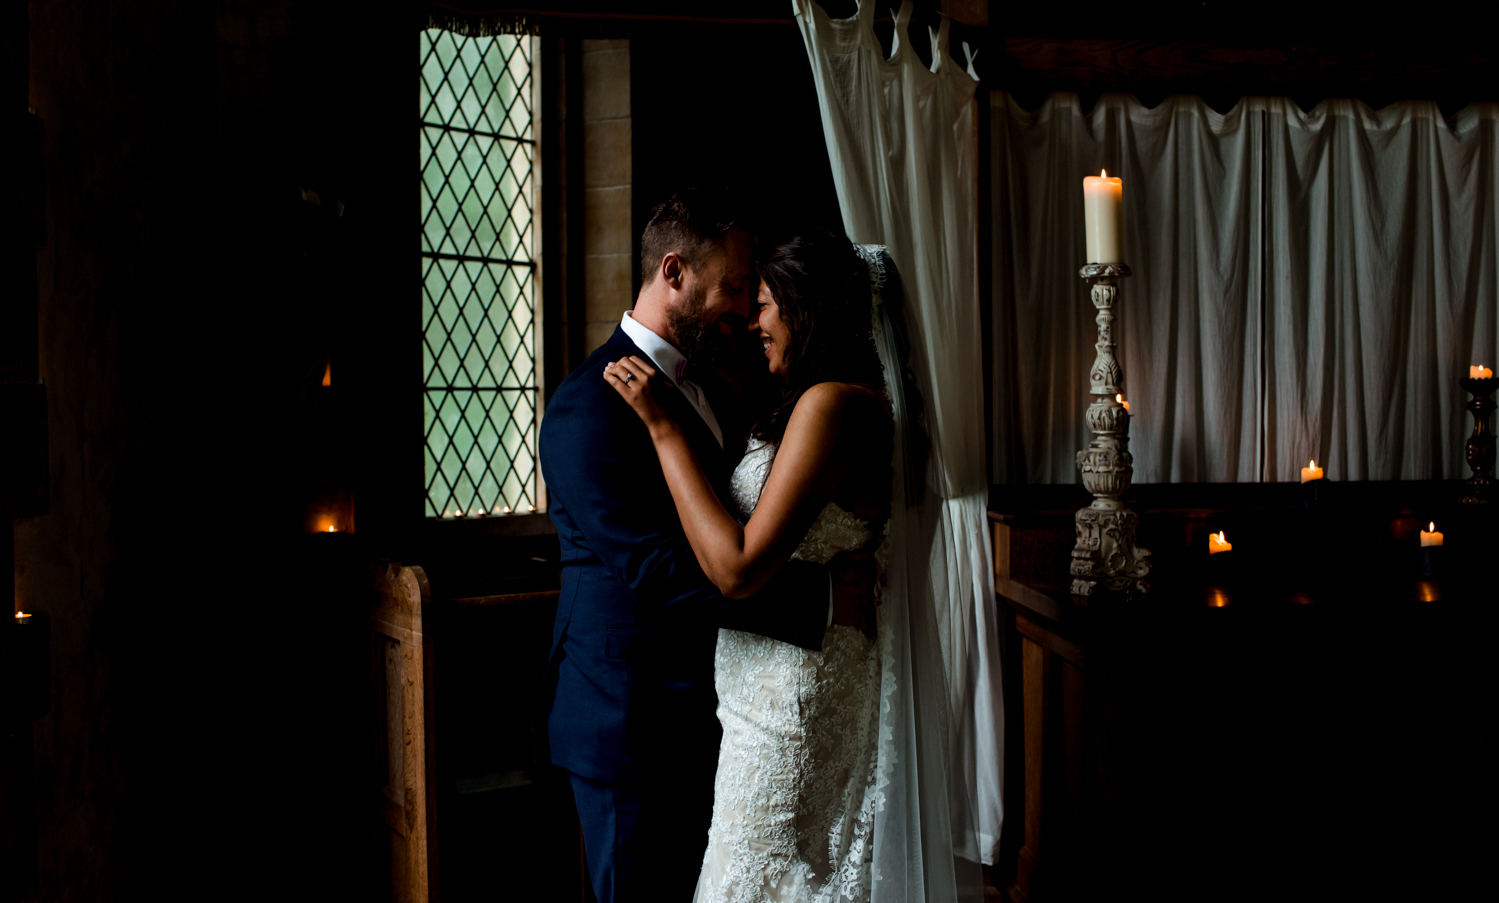 romantic lighting on couple inside belladrum temple